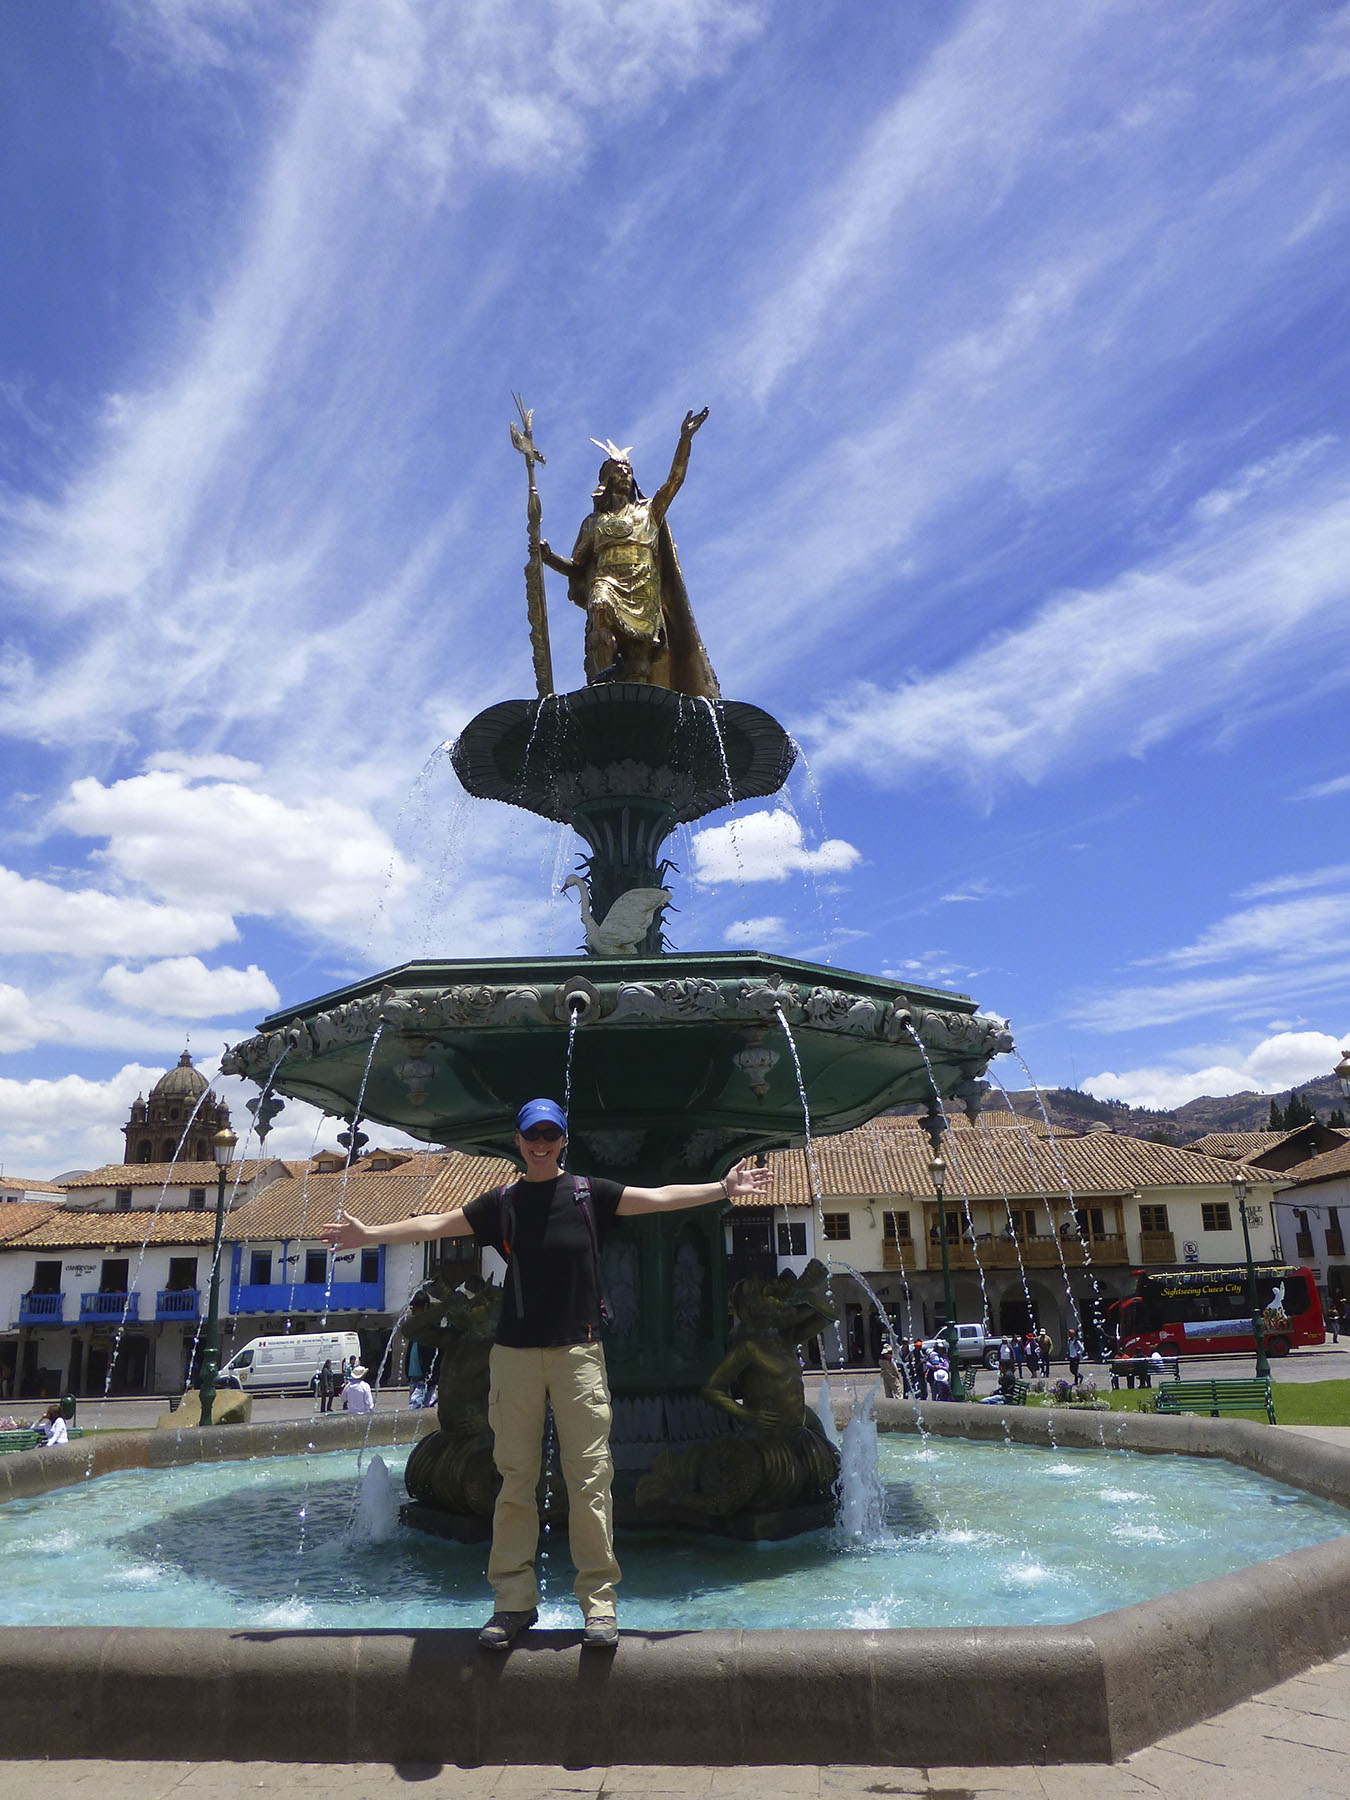 Fountain of Pachacutec